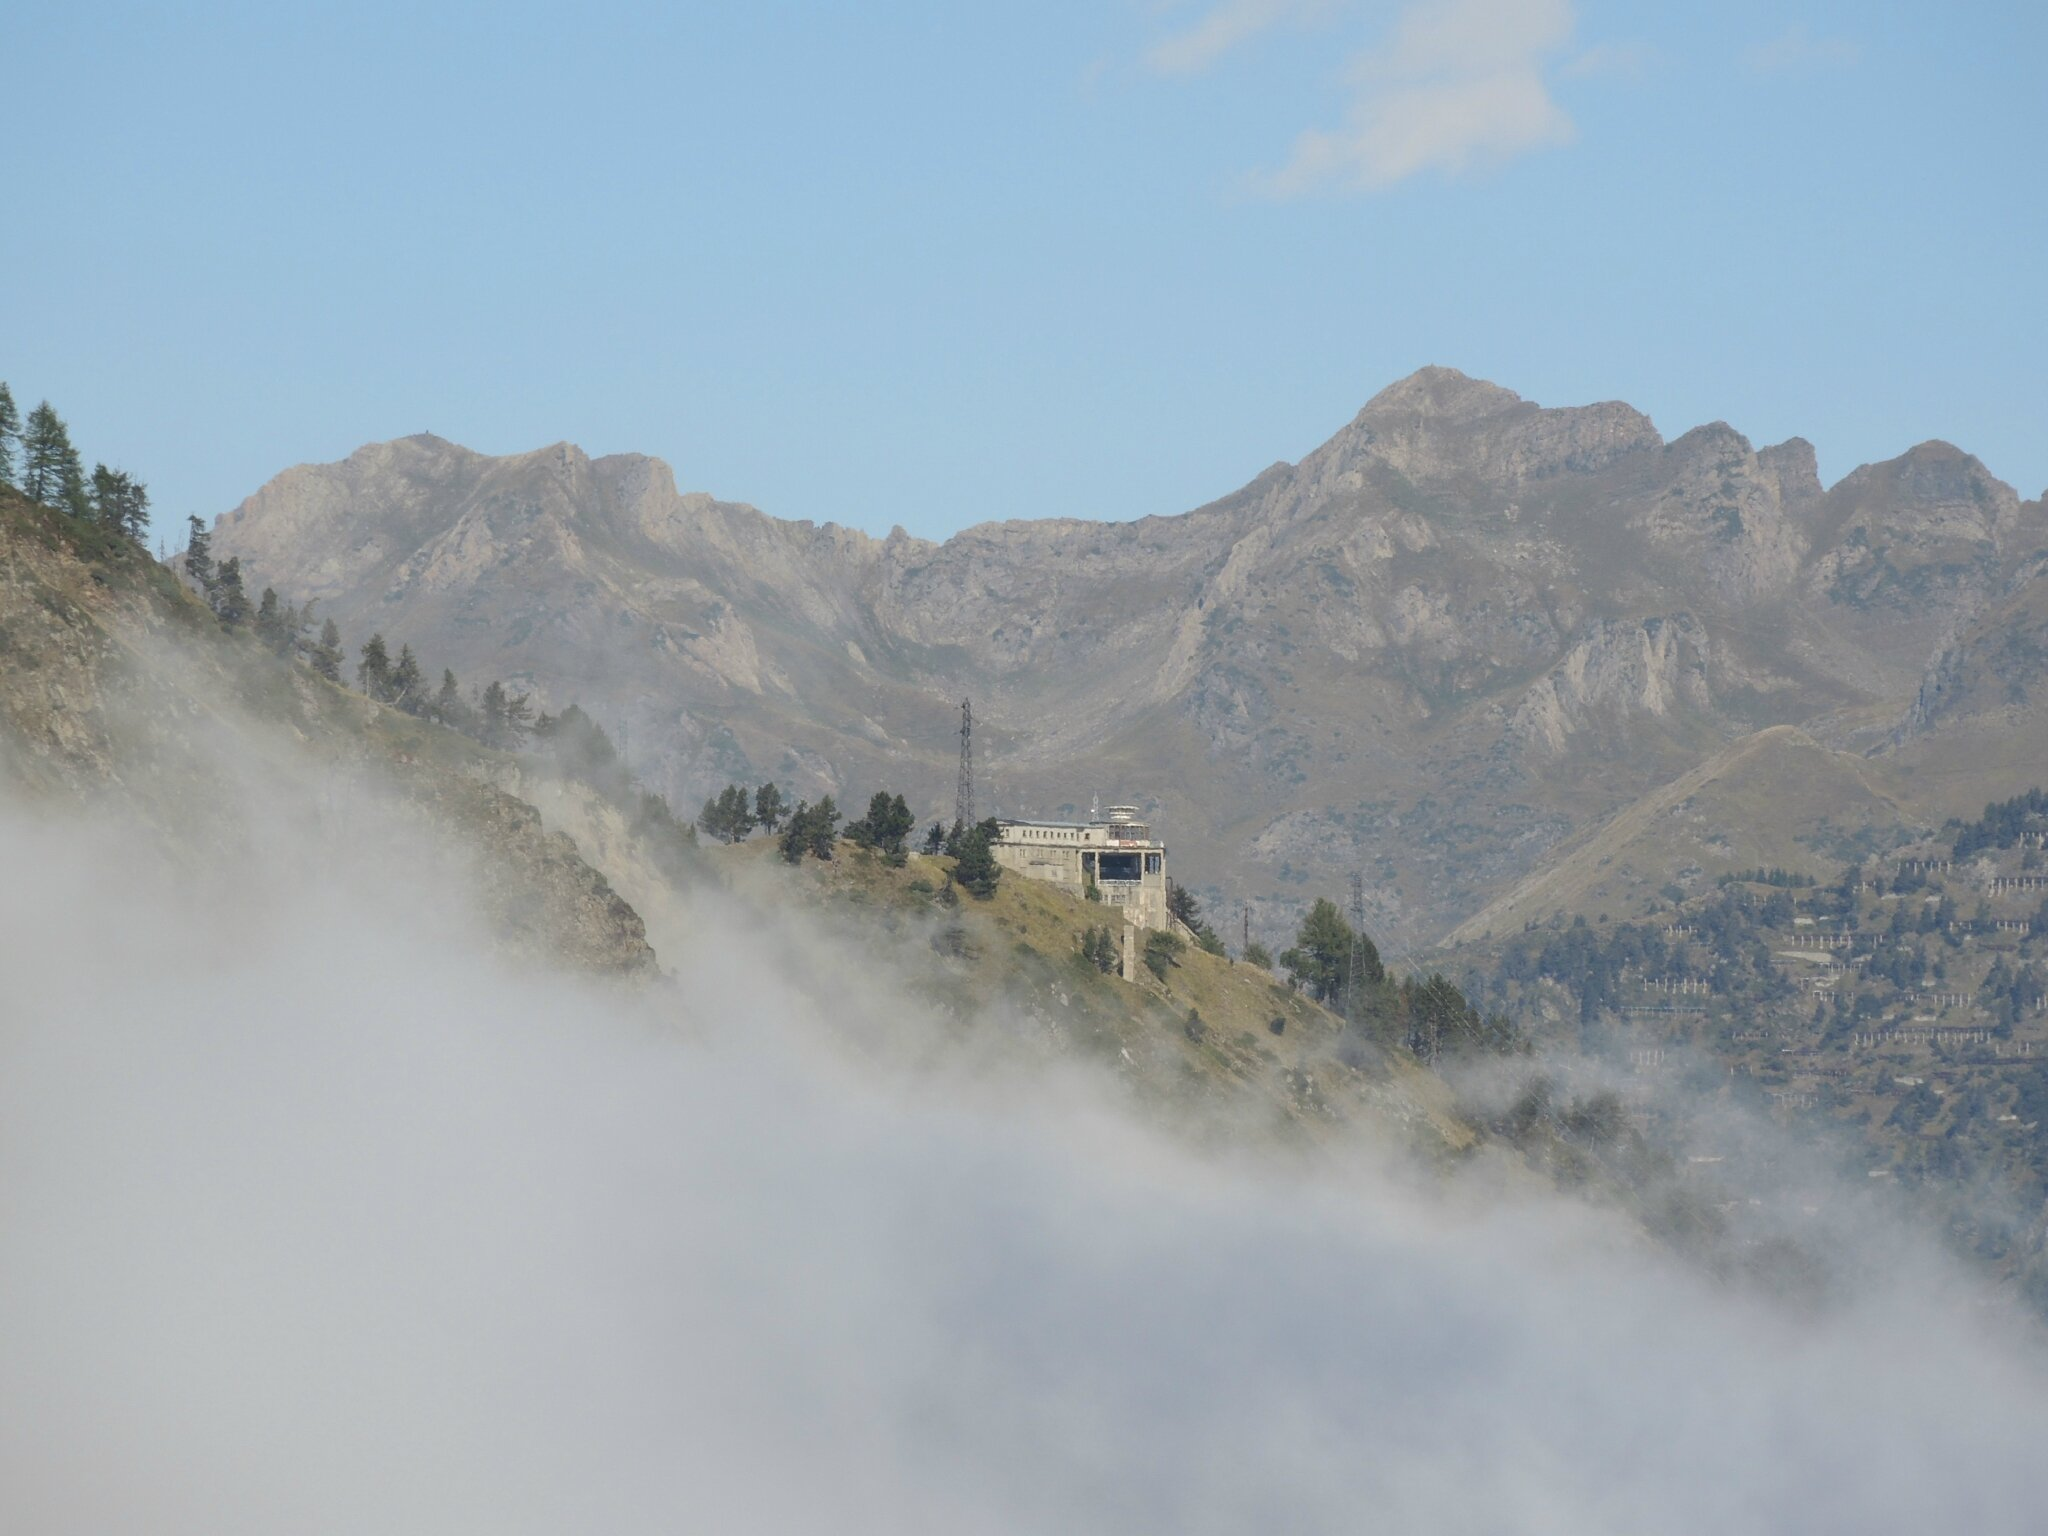 Vallée de la Glère, funiculaire de la Solitude et brouillard (65)